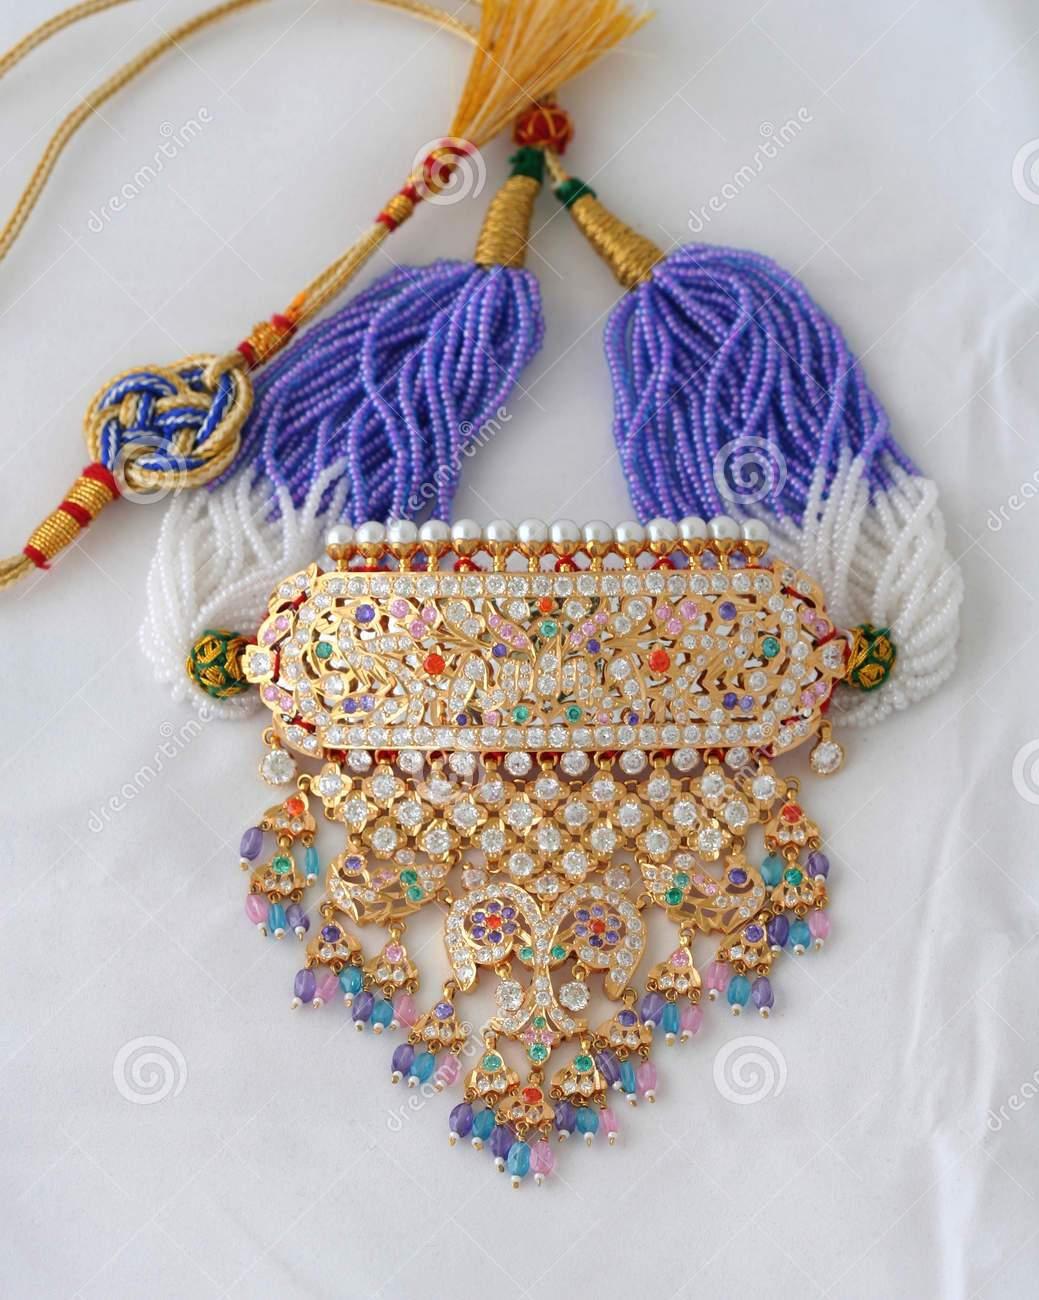 Rajputi Culture: Rajputi jewellery: \'Timaniya\'